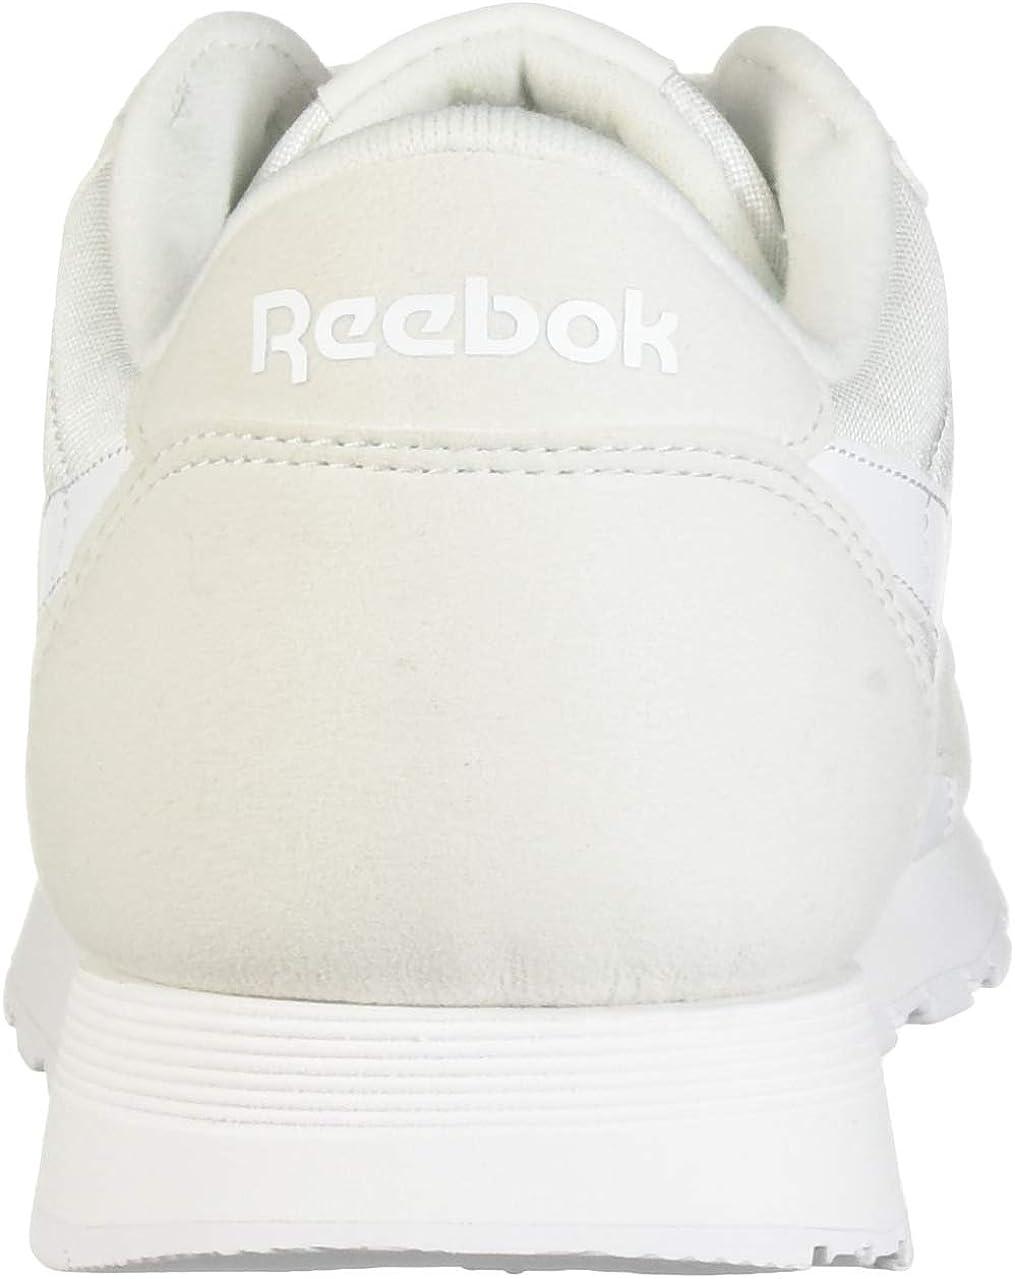 Reebok Lifestyle Herren Classic Nylon Color Grau Weiß